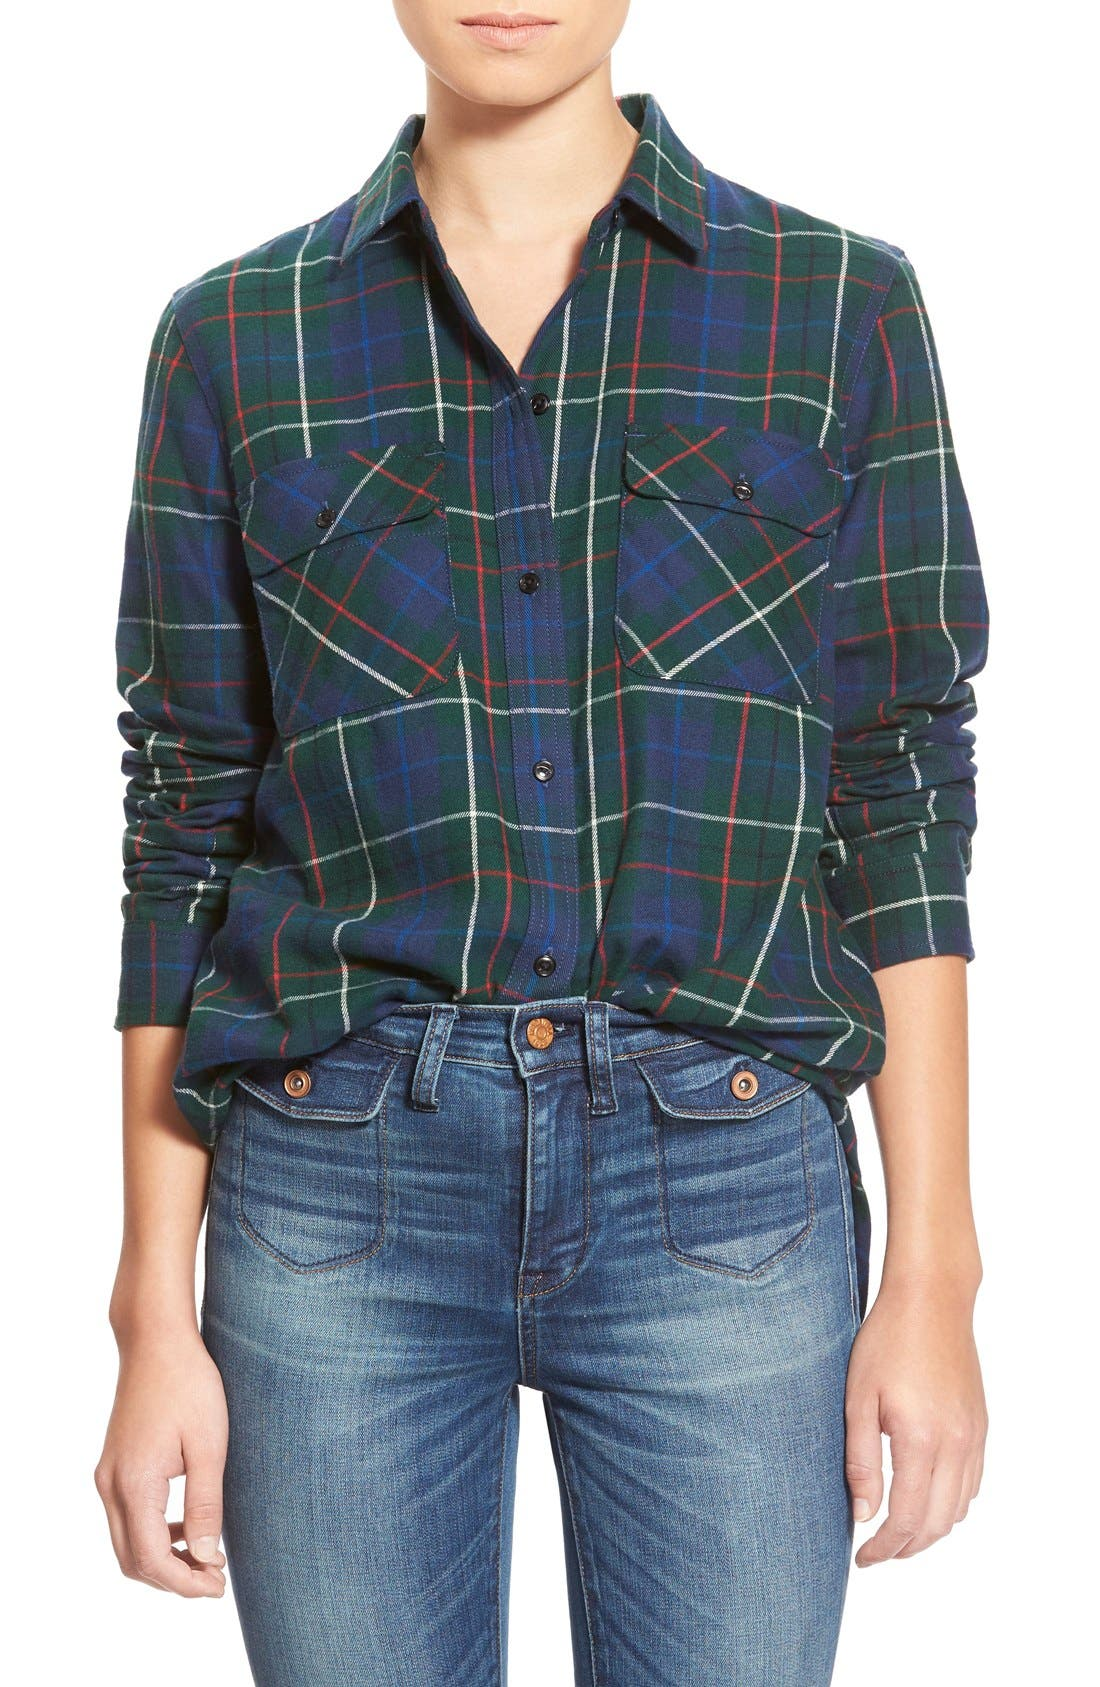 Ex Boyfriend - Ontario Plaid Flannel Shirt,                         Main,                         color, 300